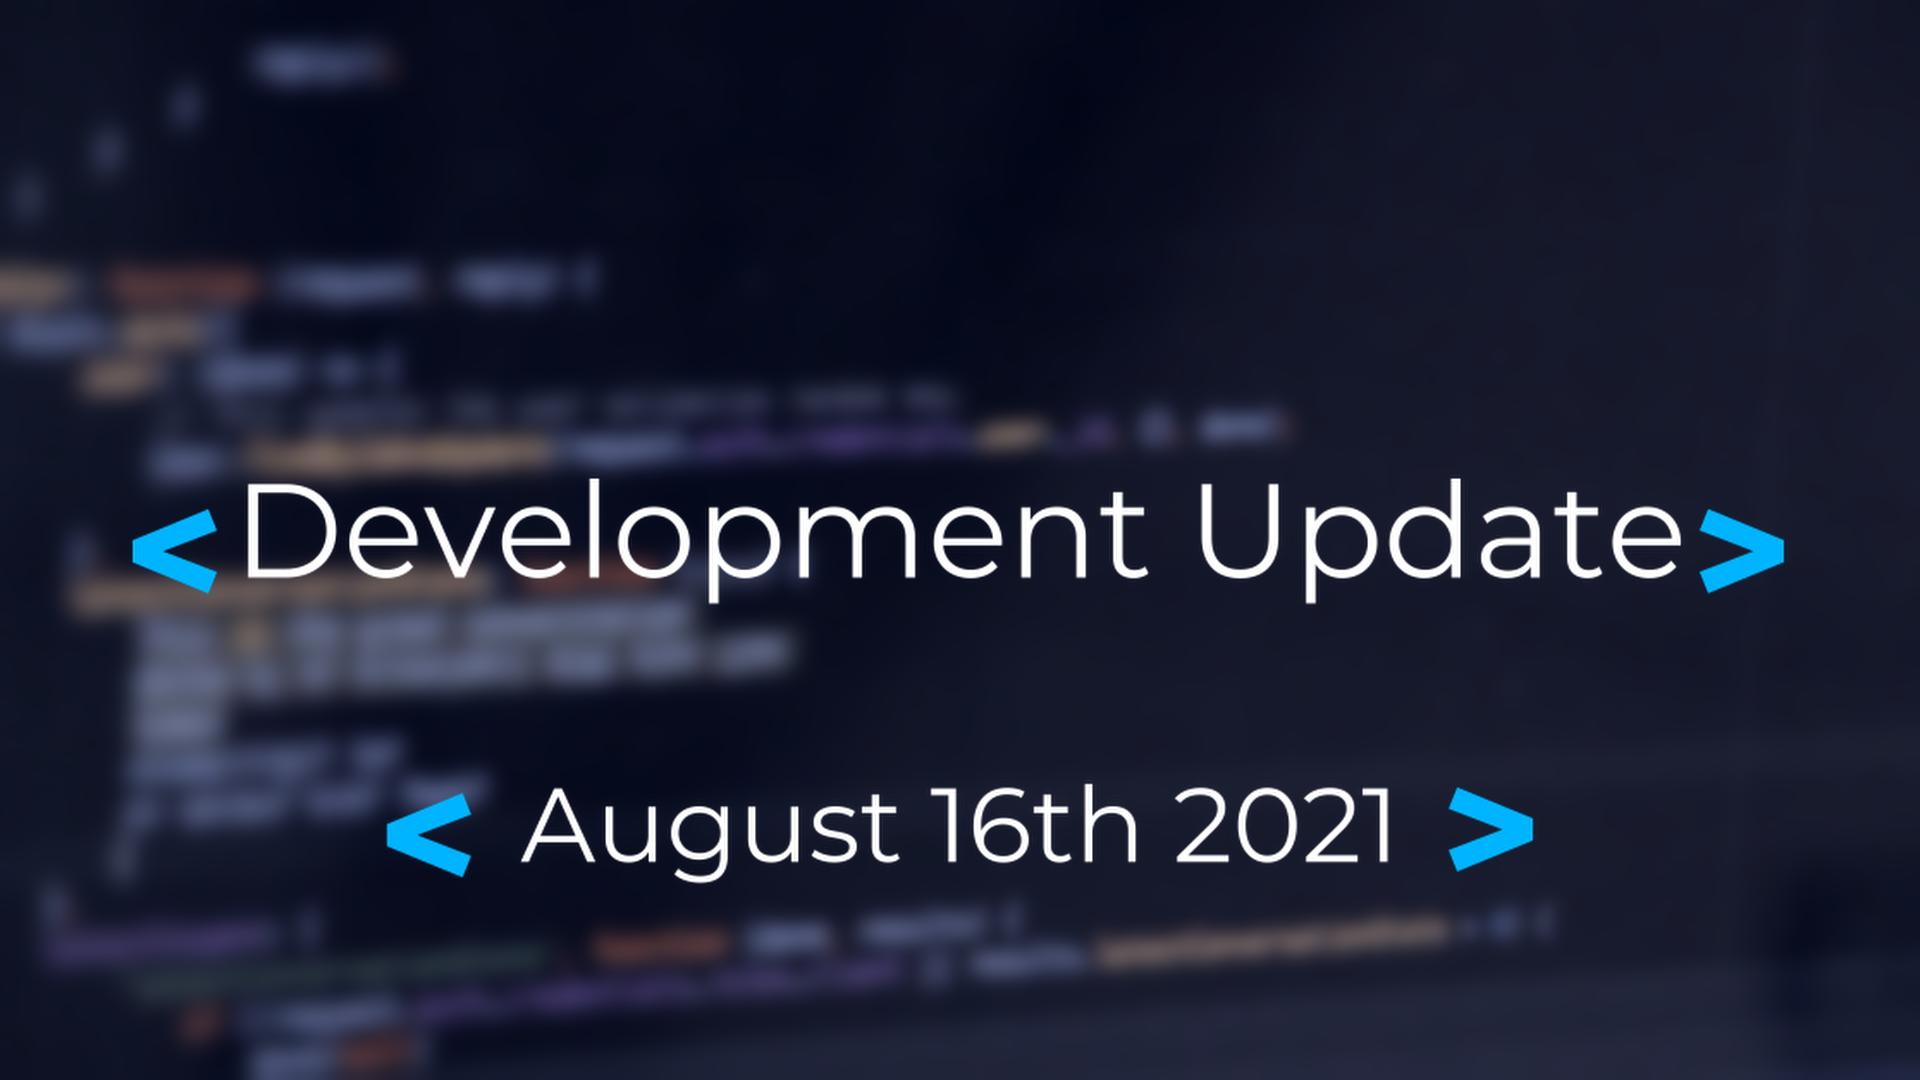 Orion: Development Update